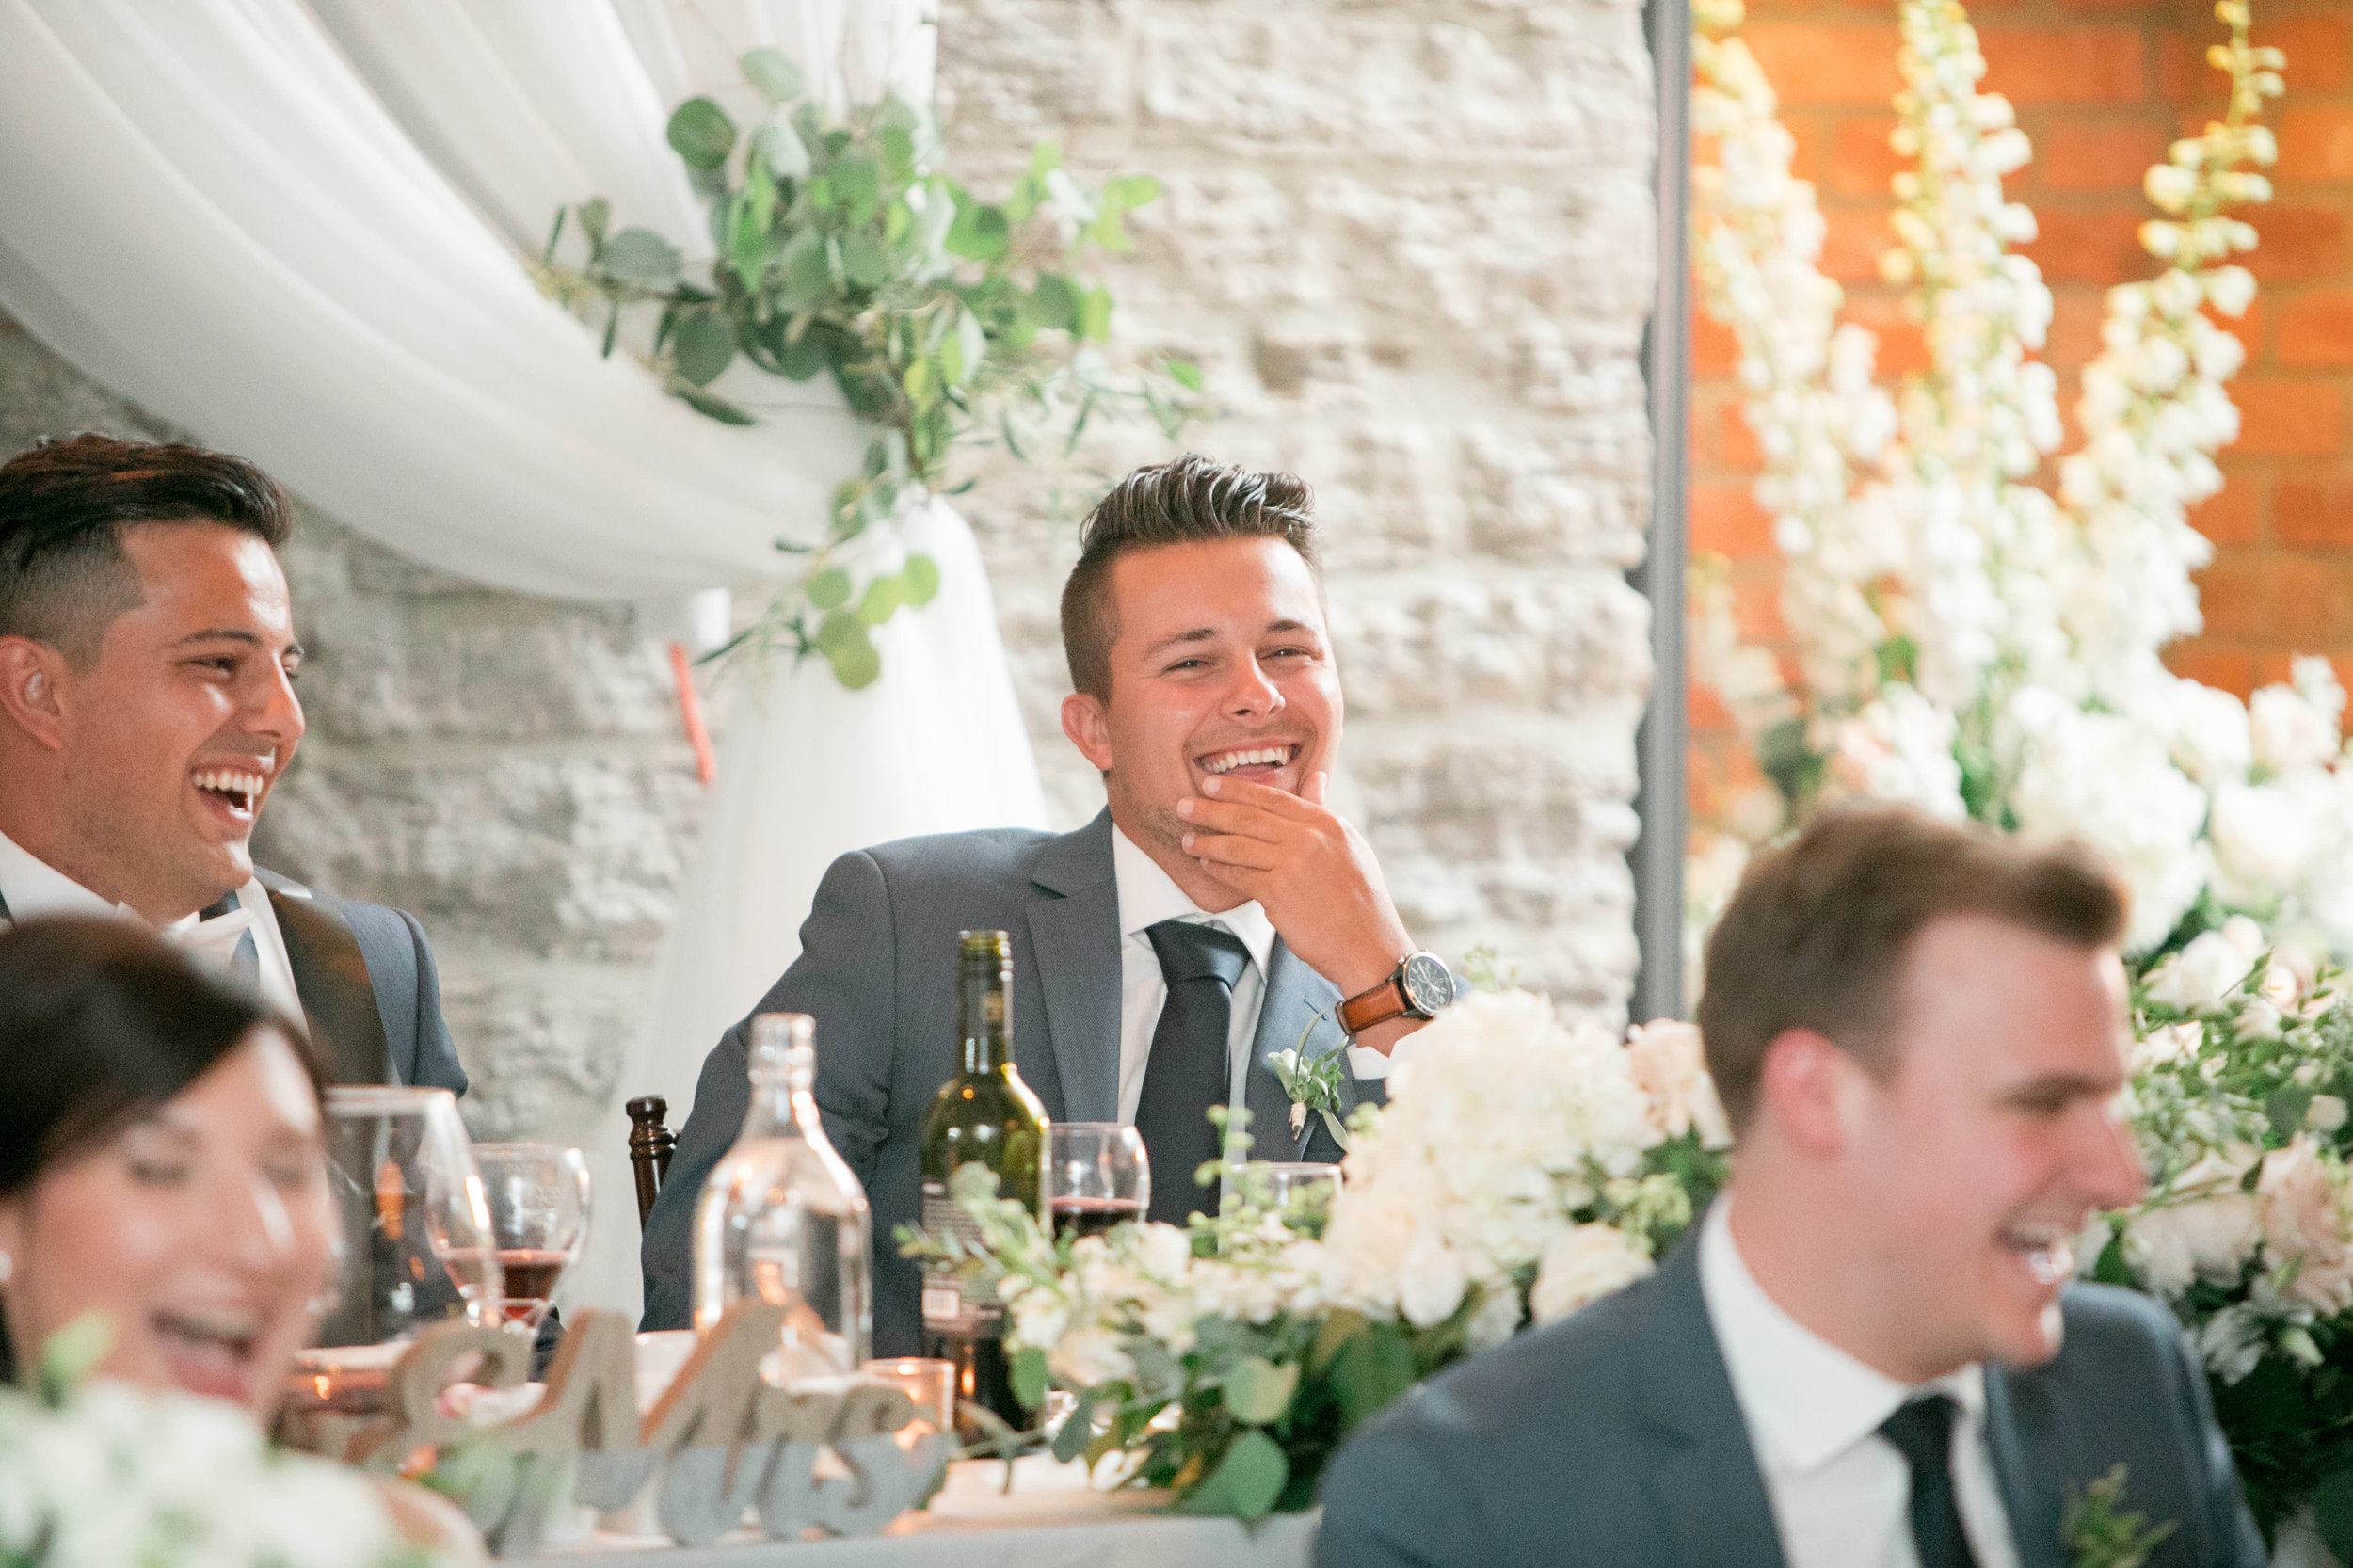 Miranda___Daniel___Daniel_Ricci_Weddings___High_Res._Finals_554.jpg